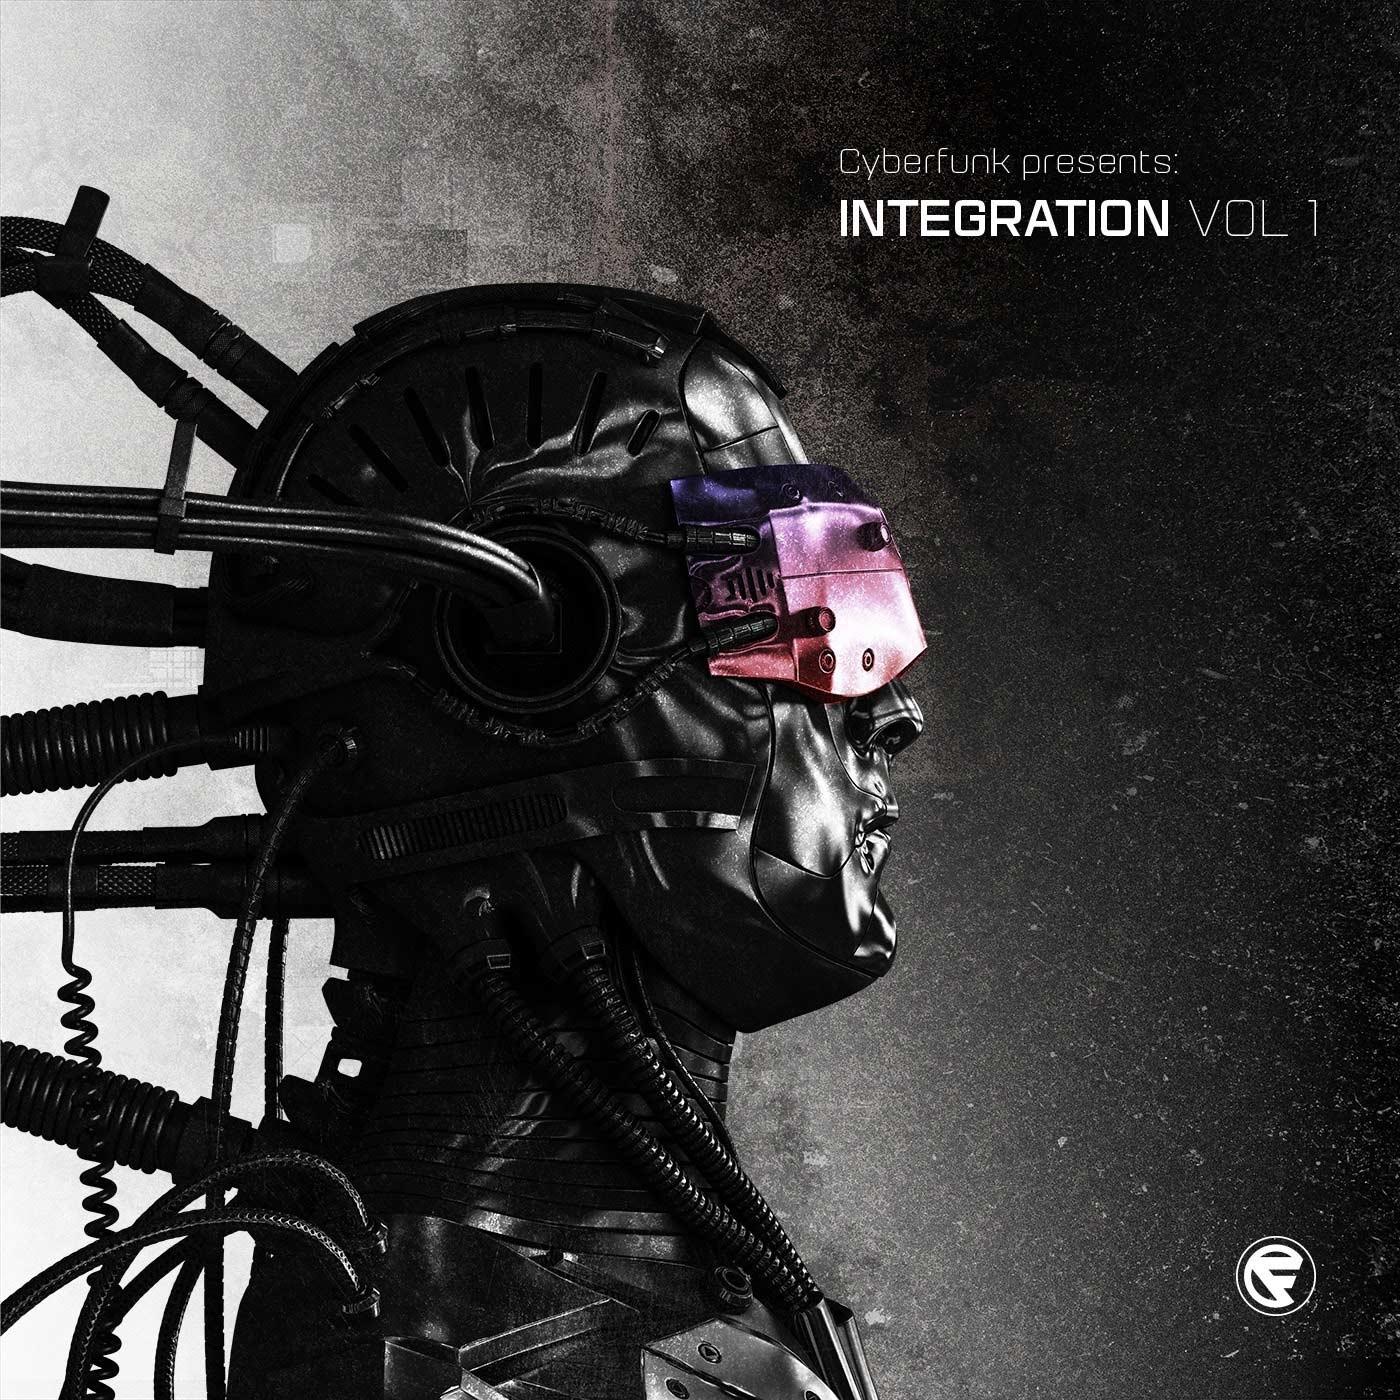 Integration-Vol-1-Cyberfunk-Cover